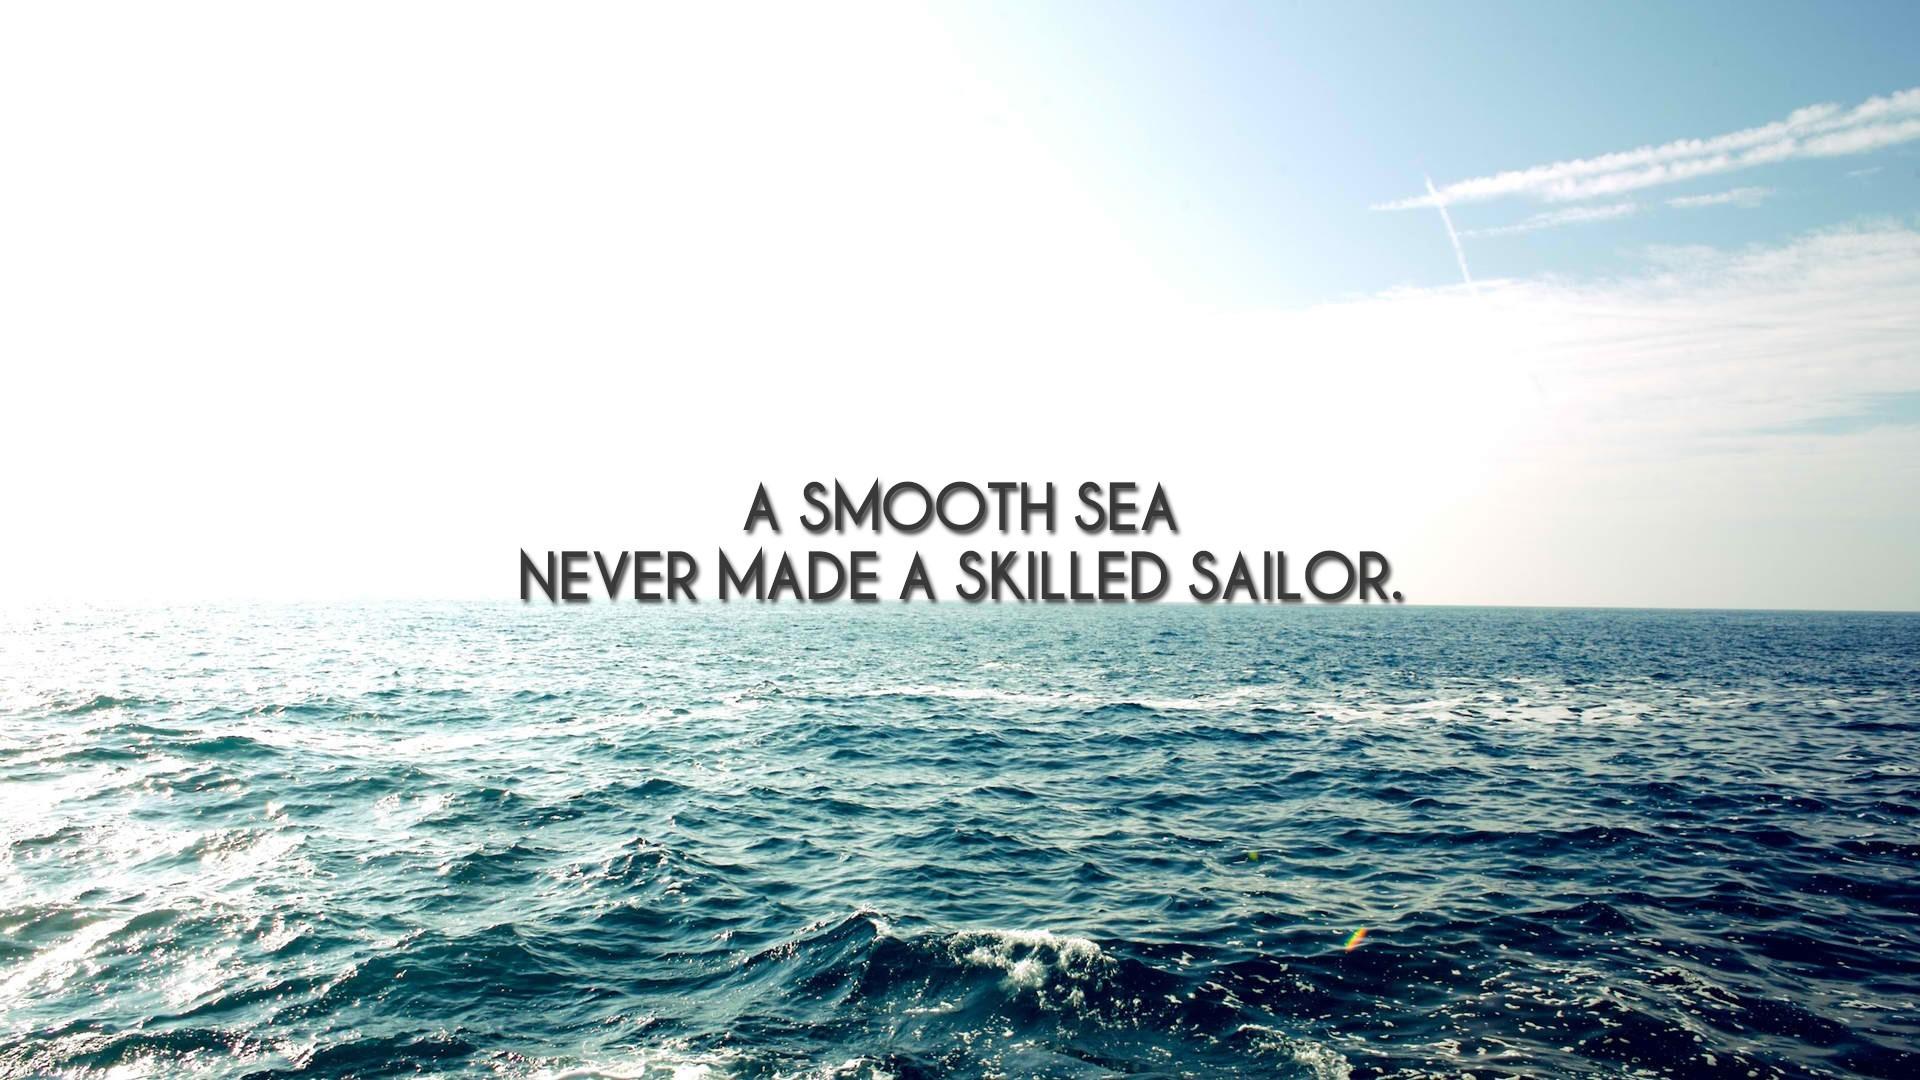 Sailor at sea inspirational quote HD Wallpaper, Desktop Background .